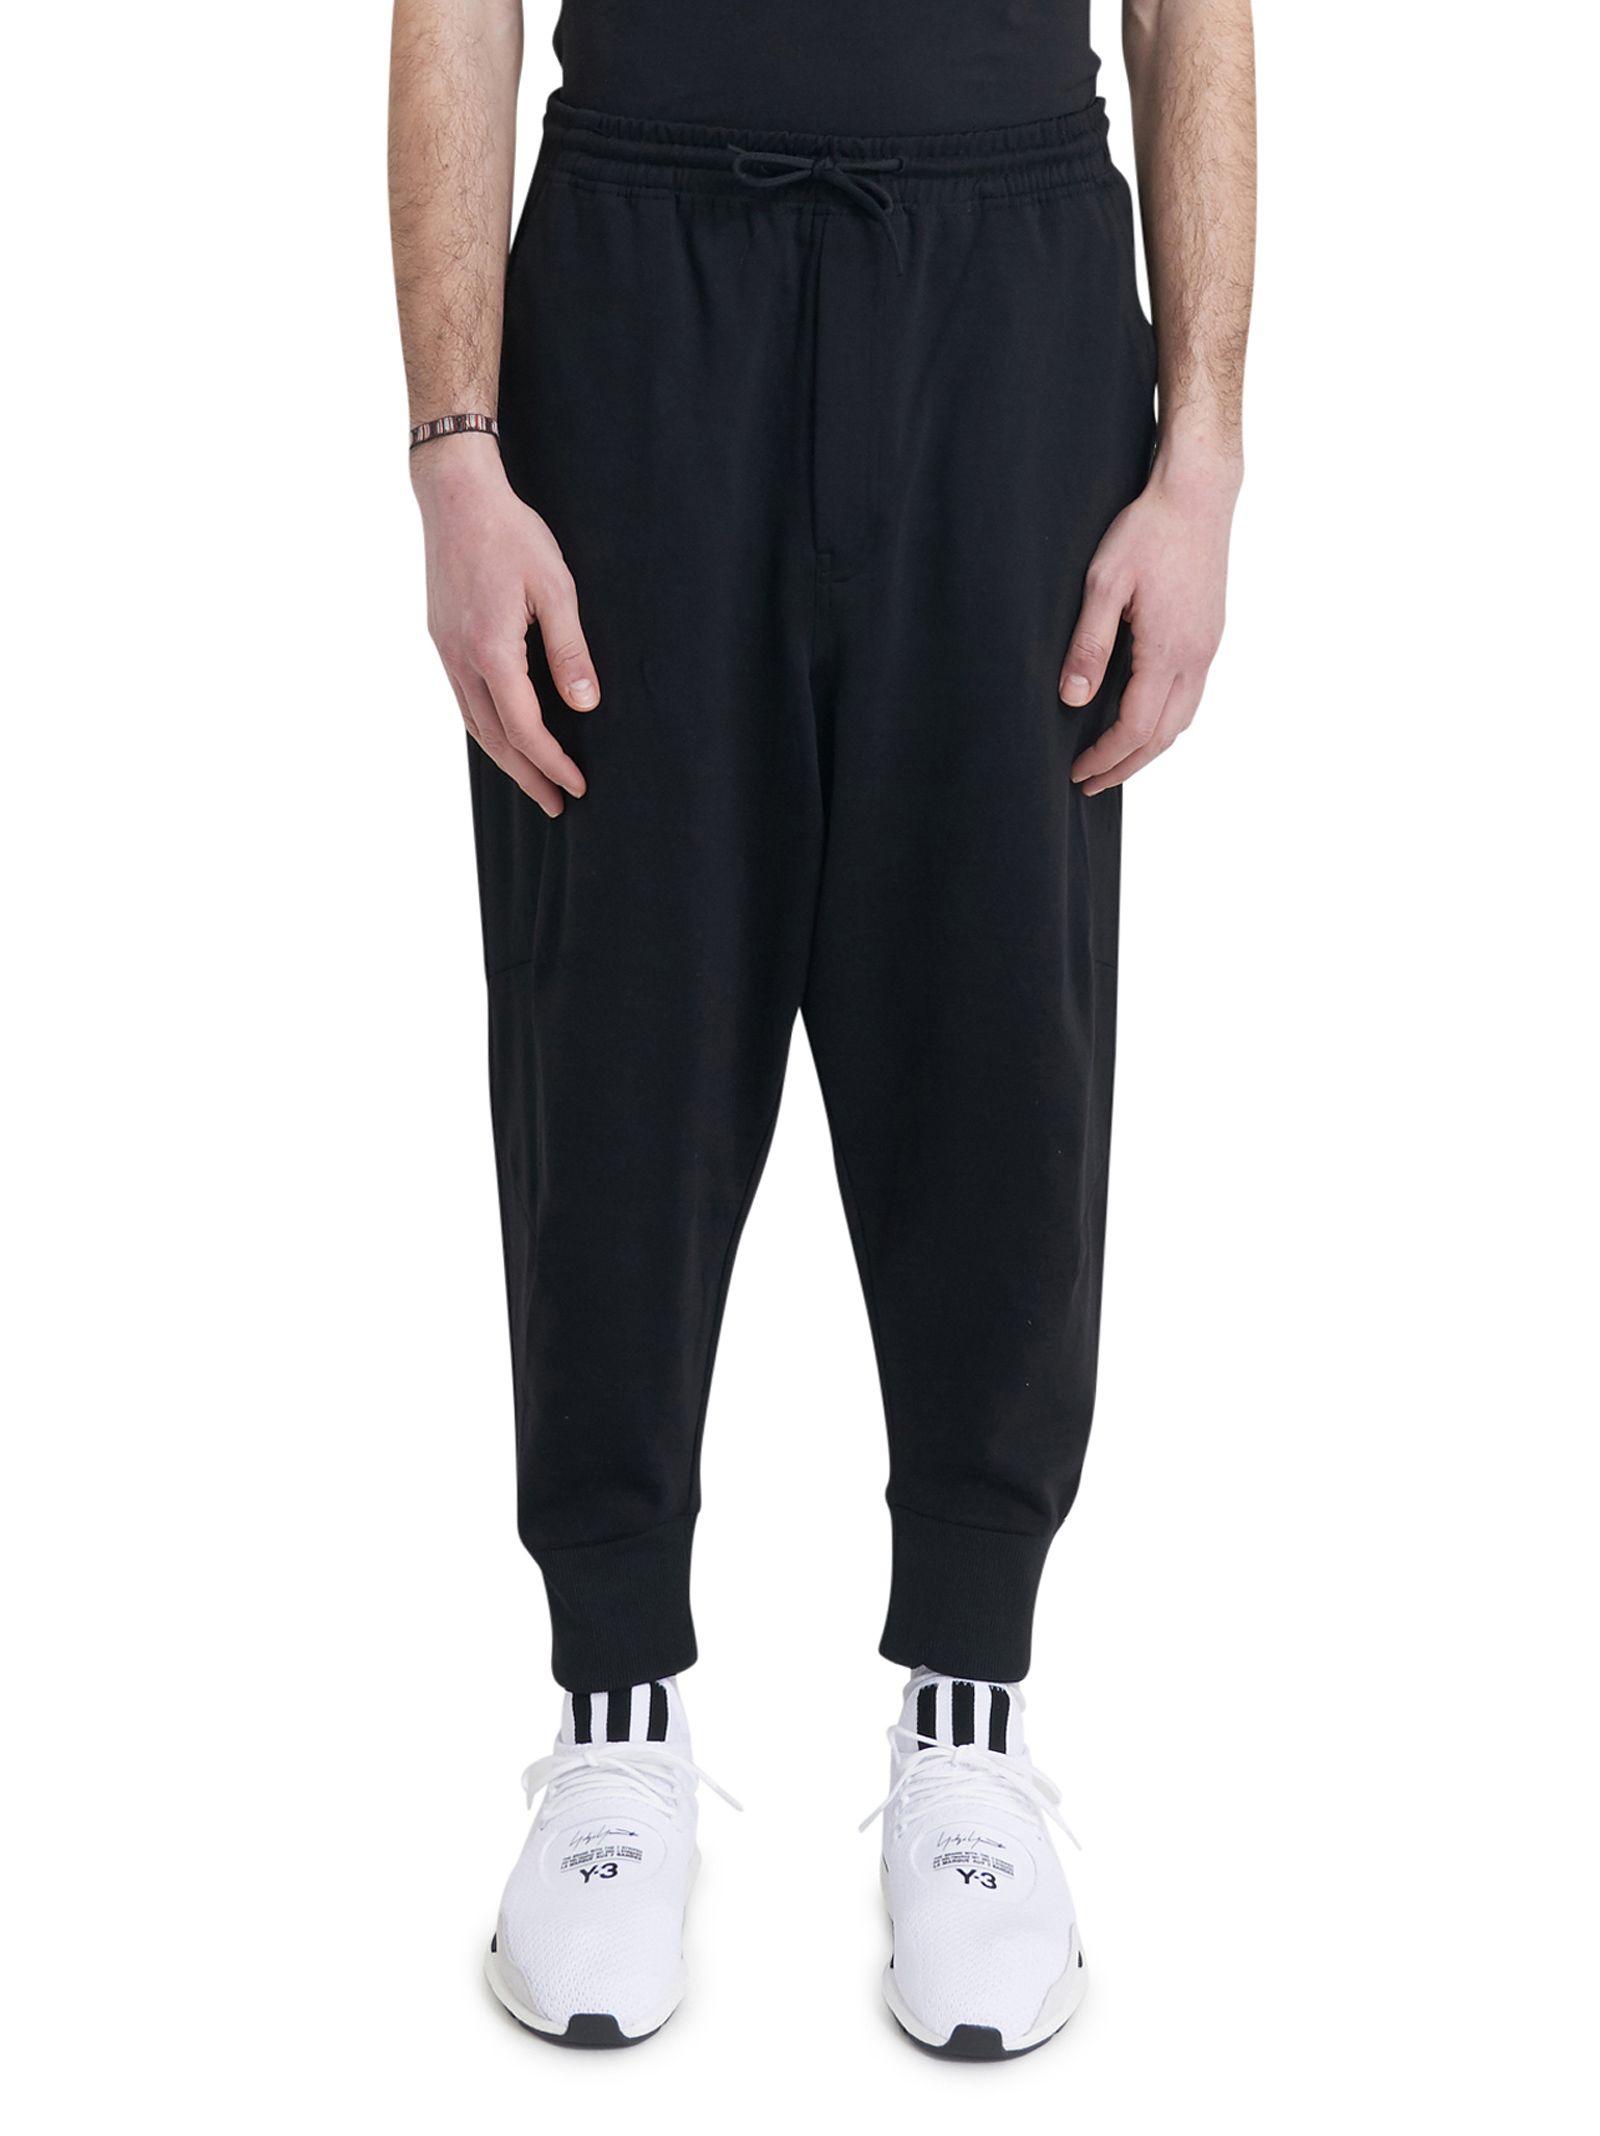 Short Sporty Pants